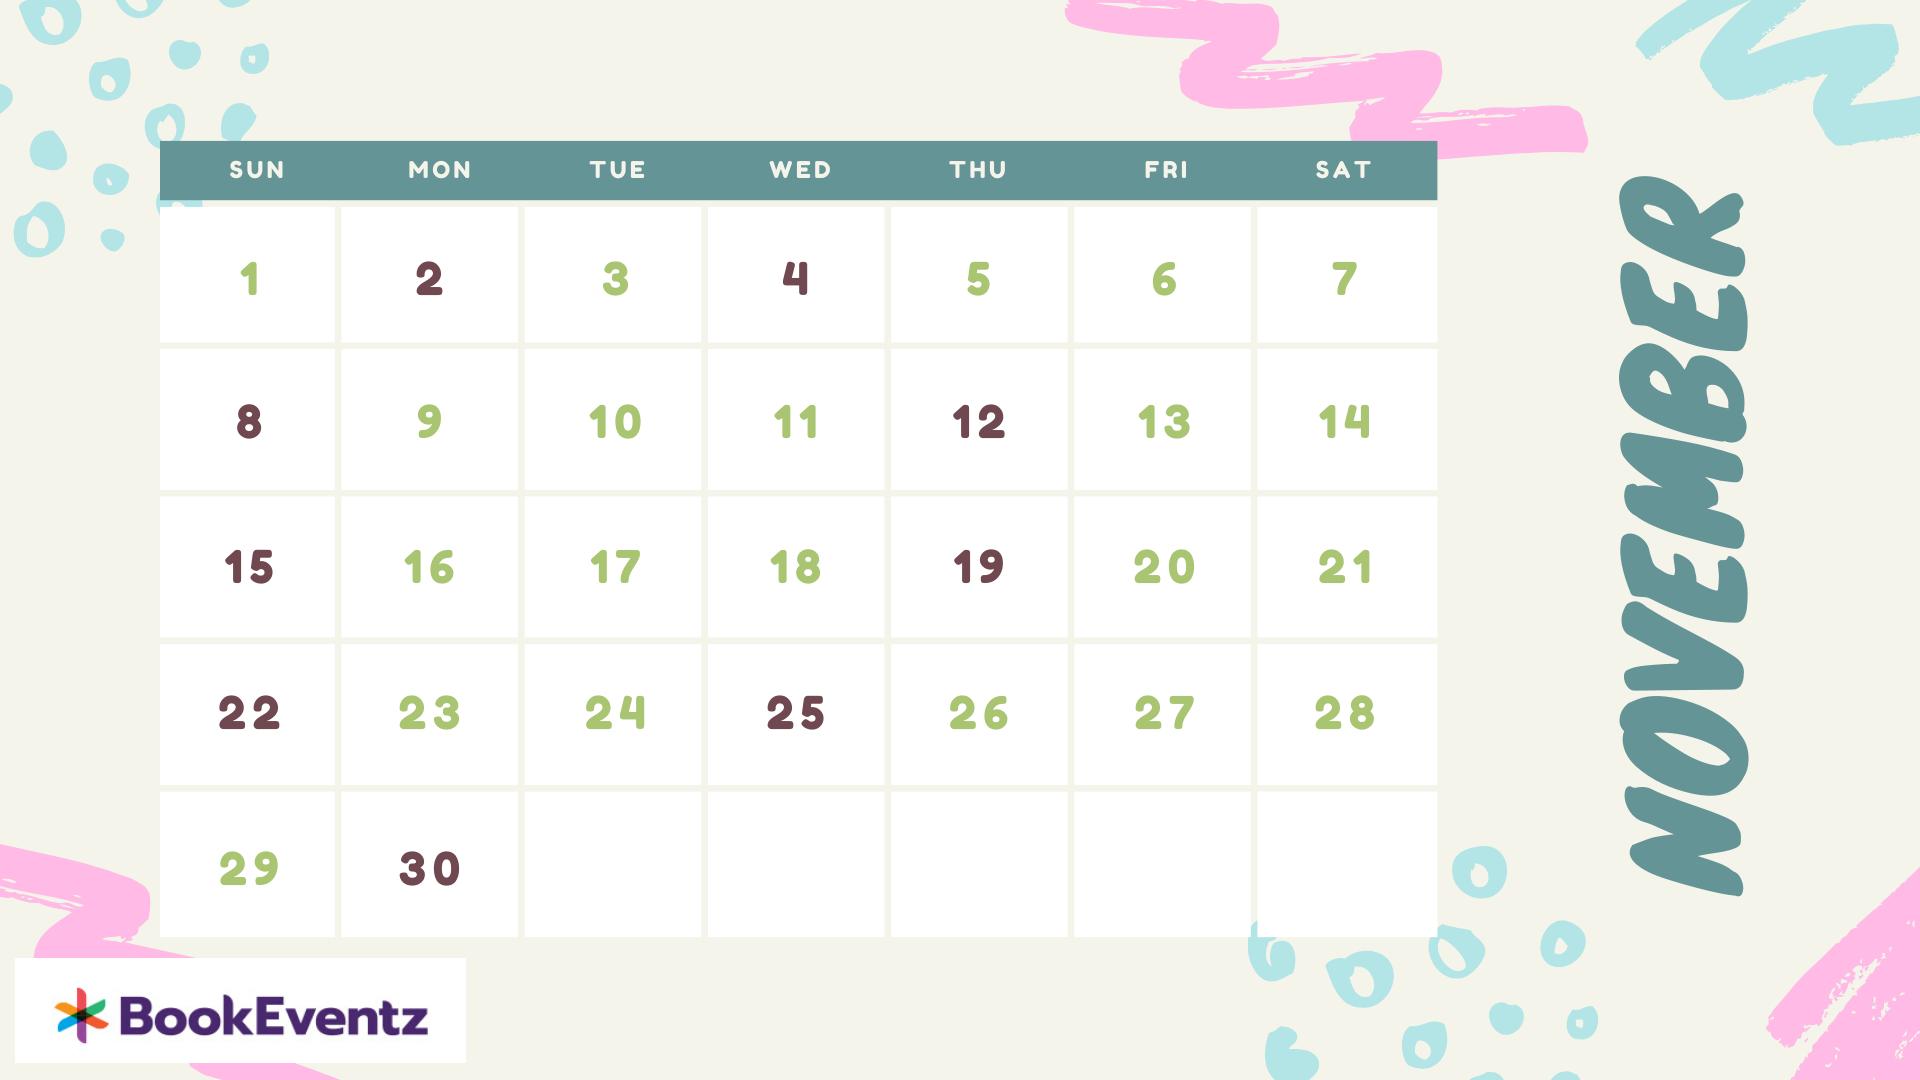 November Namkaran Muhurat Dates 2020